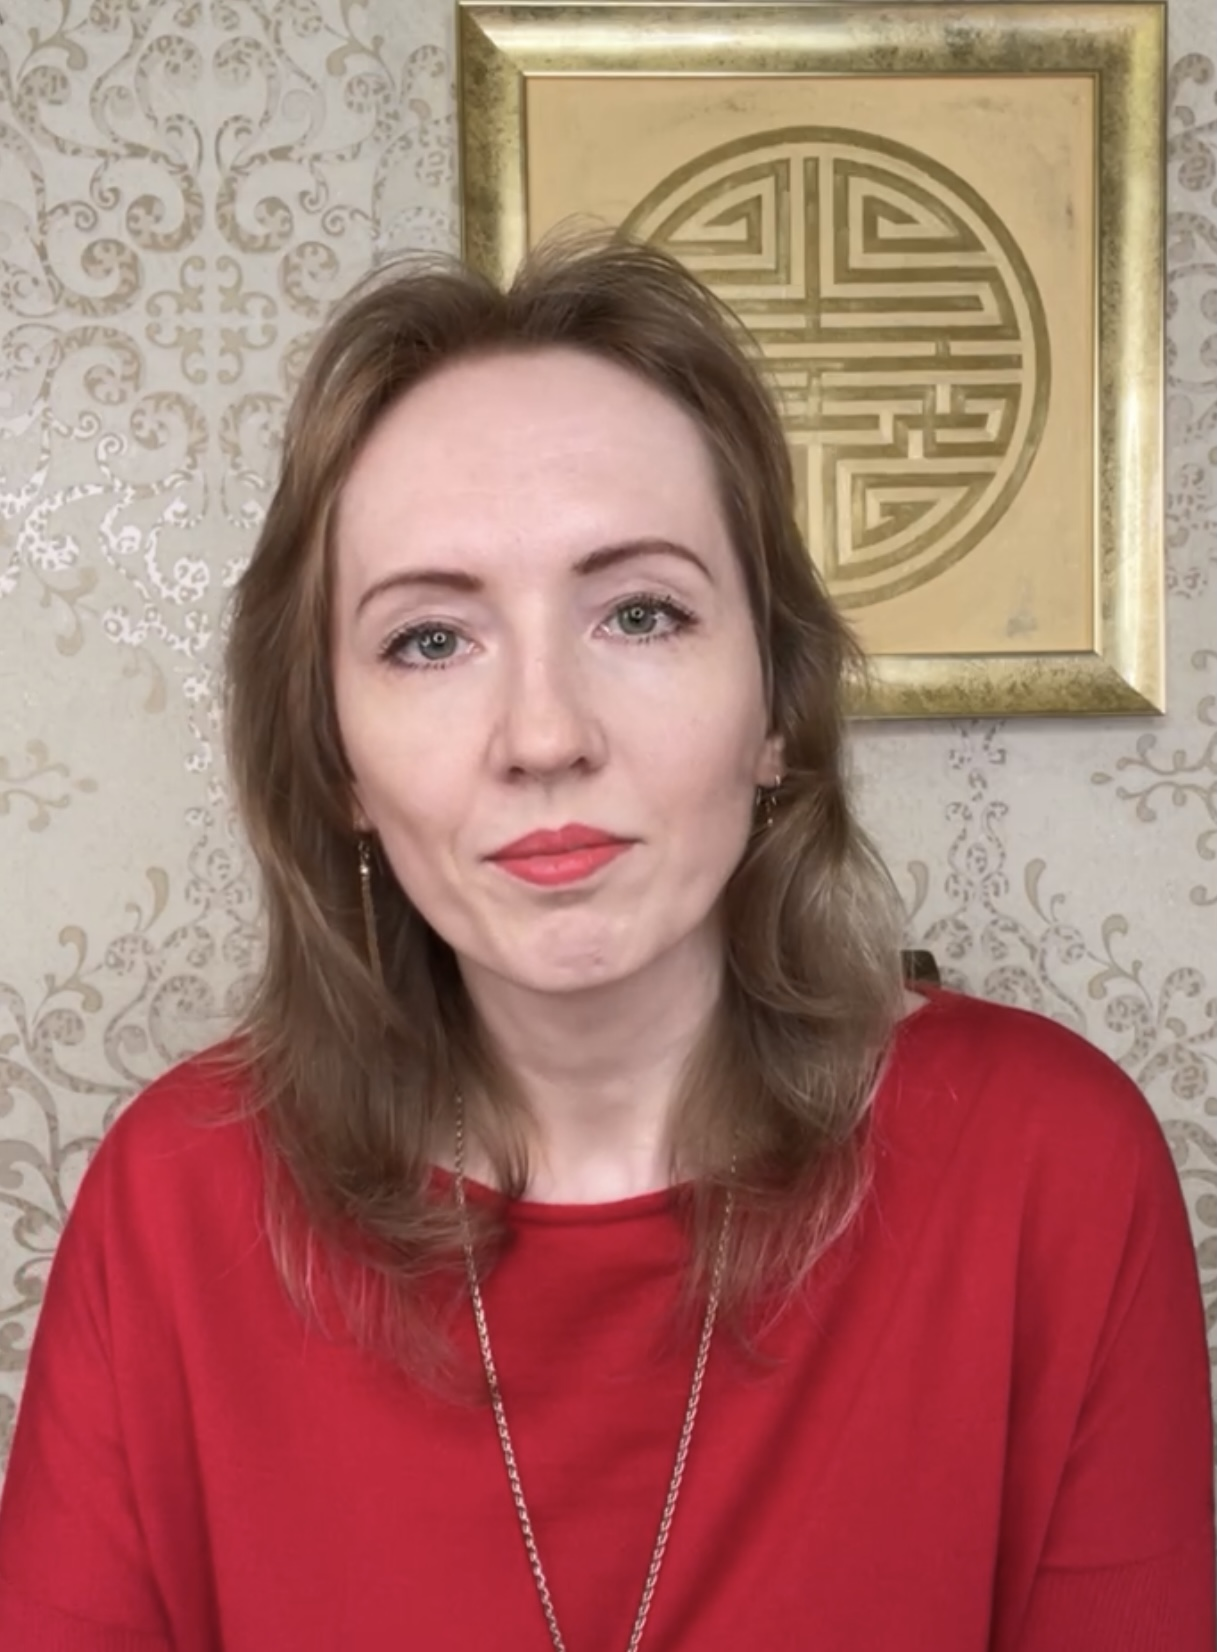 Милана Минаева о Ретроградном Меркурии - Milana.Ru